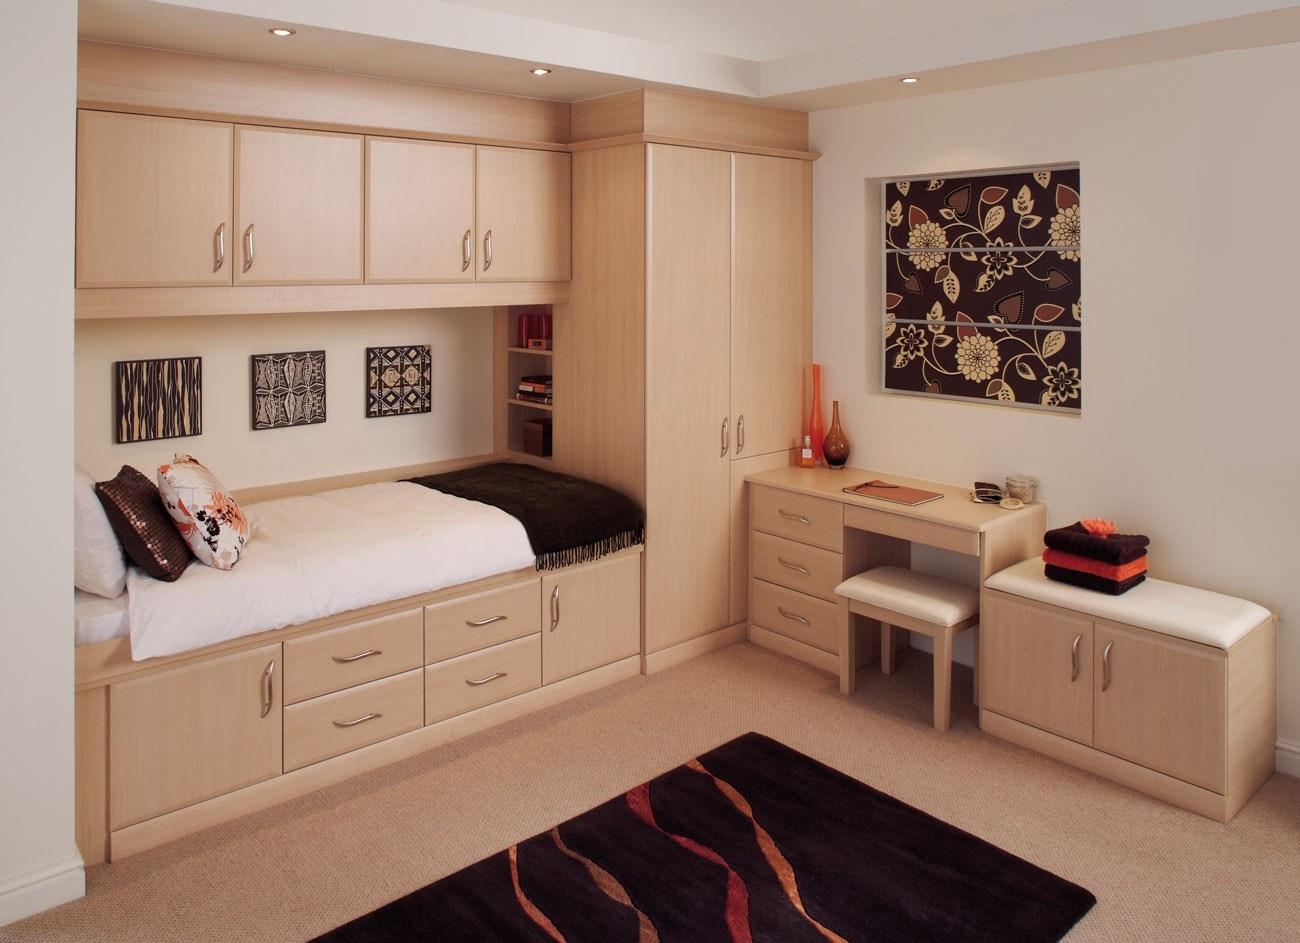 15 Photo Of Bespoke Built In Furniture